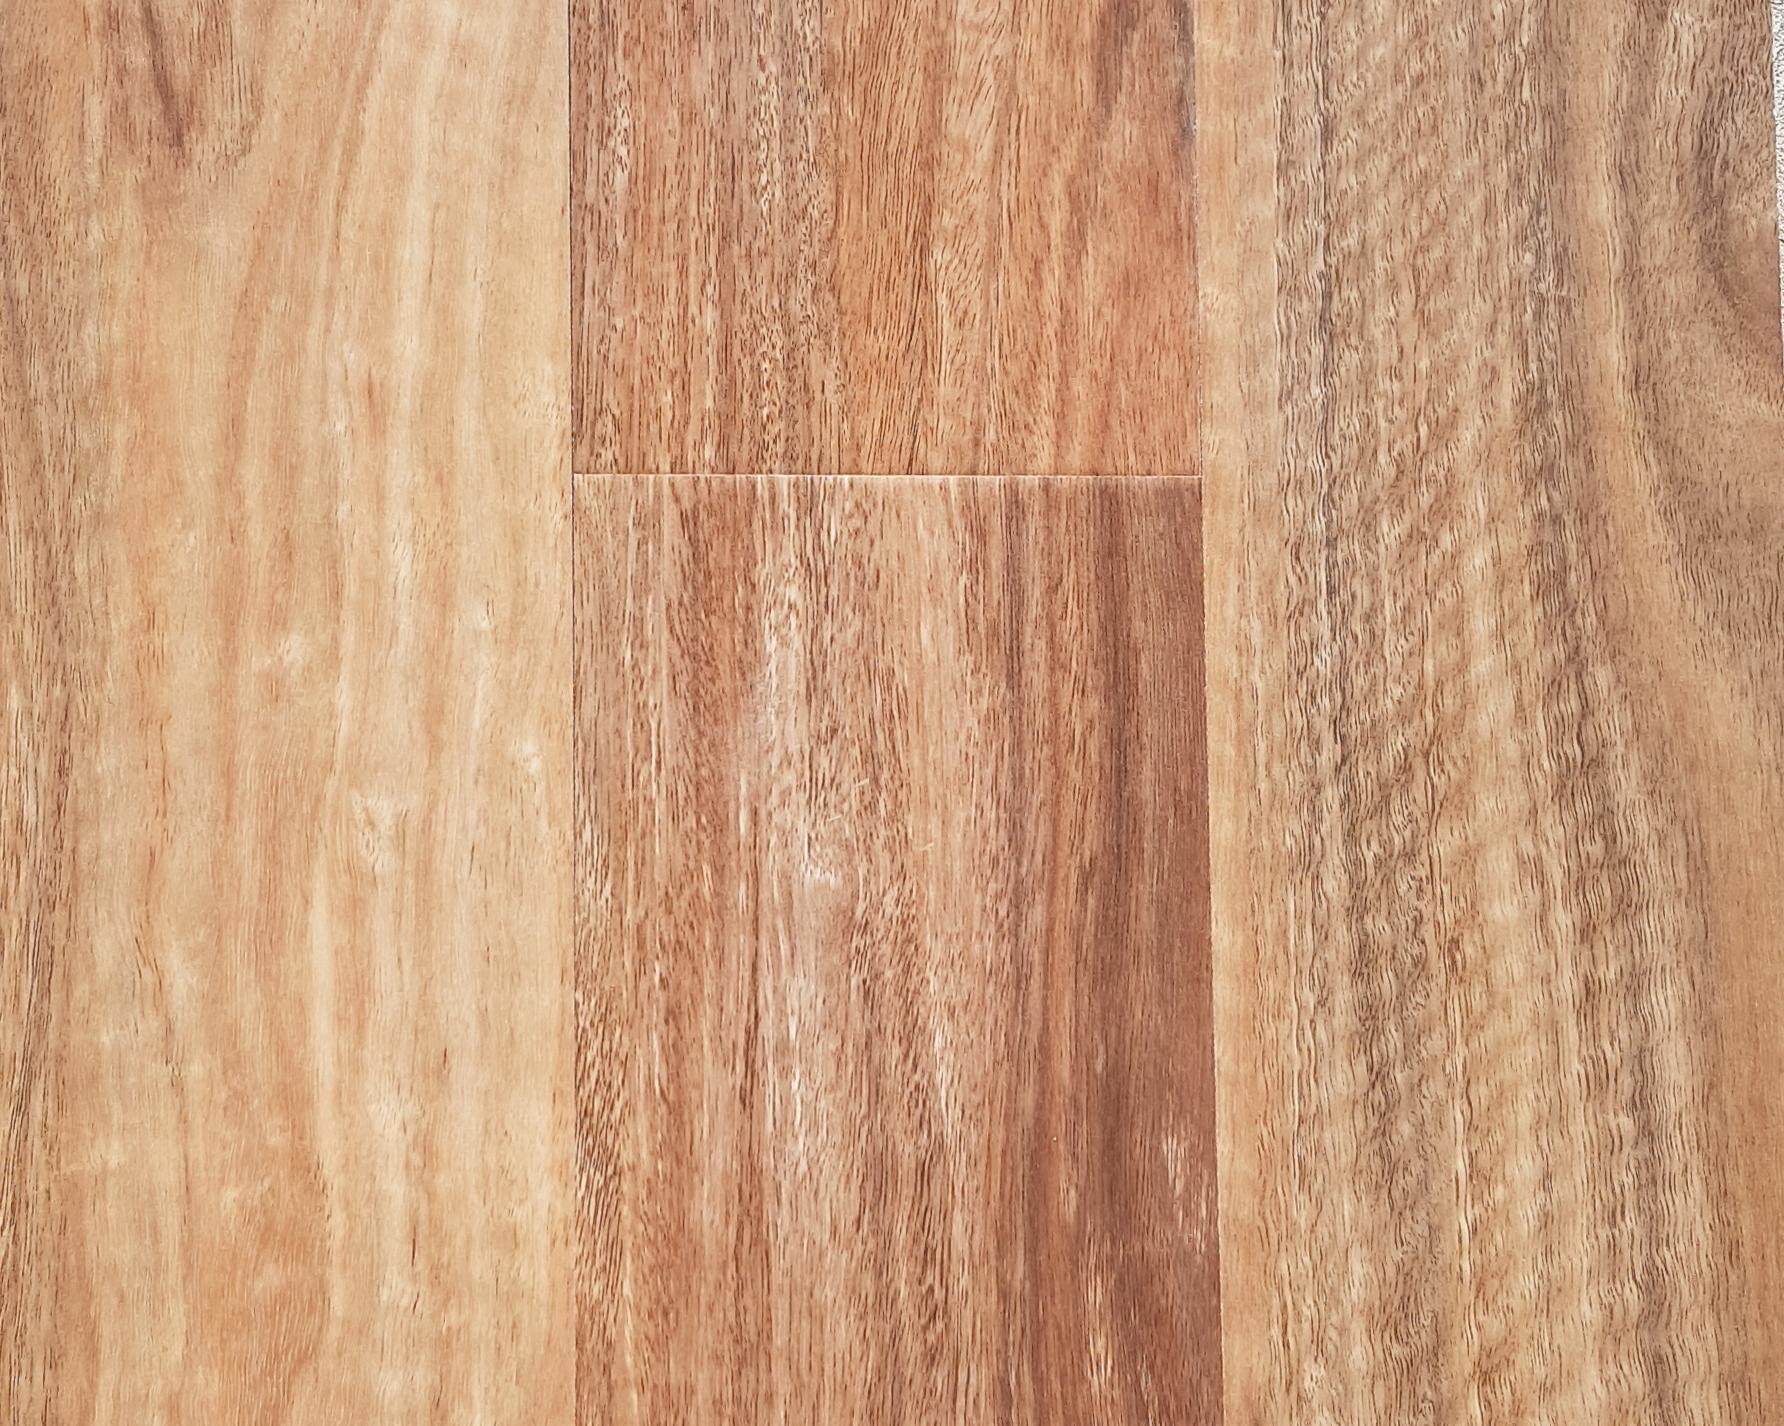 Sun Floors Imports- GFRL- Spotted Gum